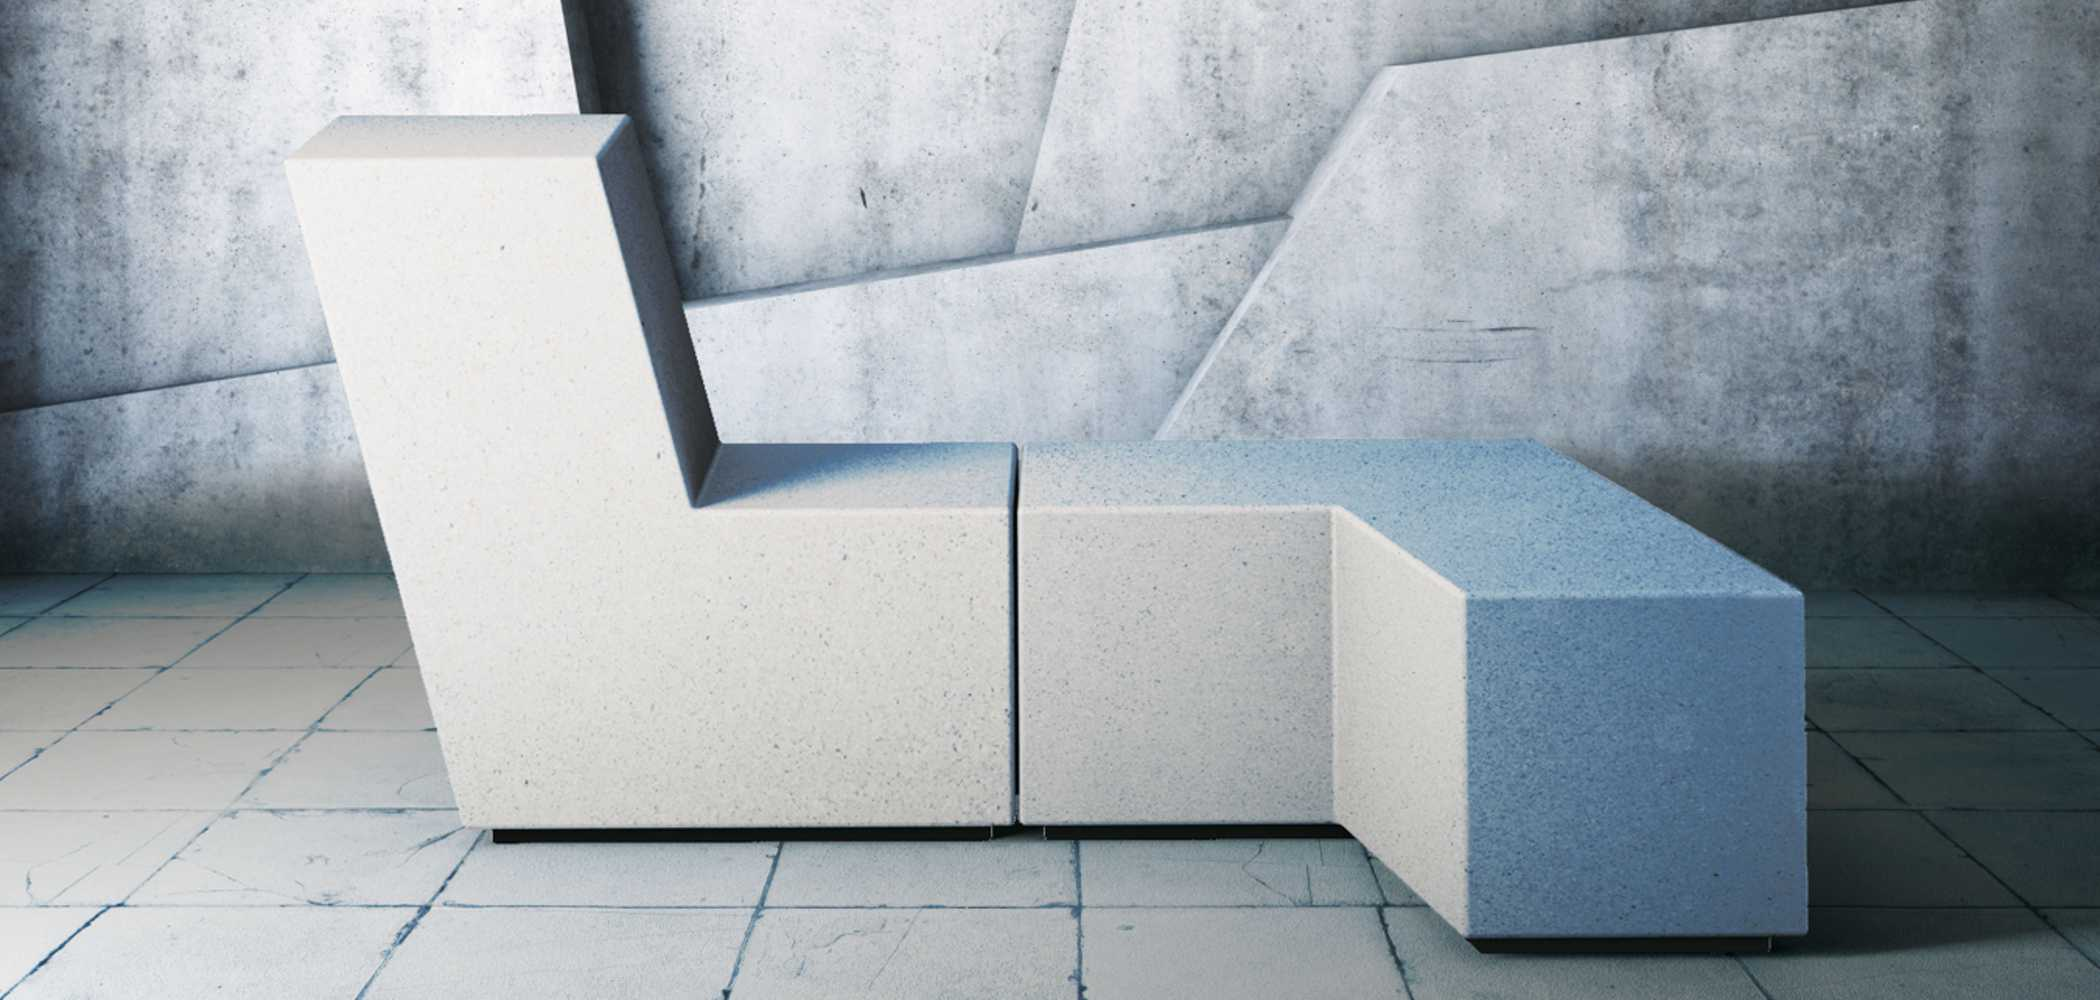 Up Monolithic Modular Bench Disseturban